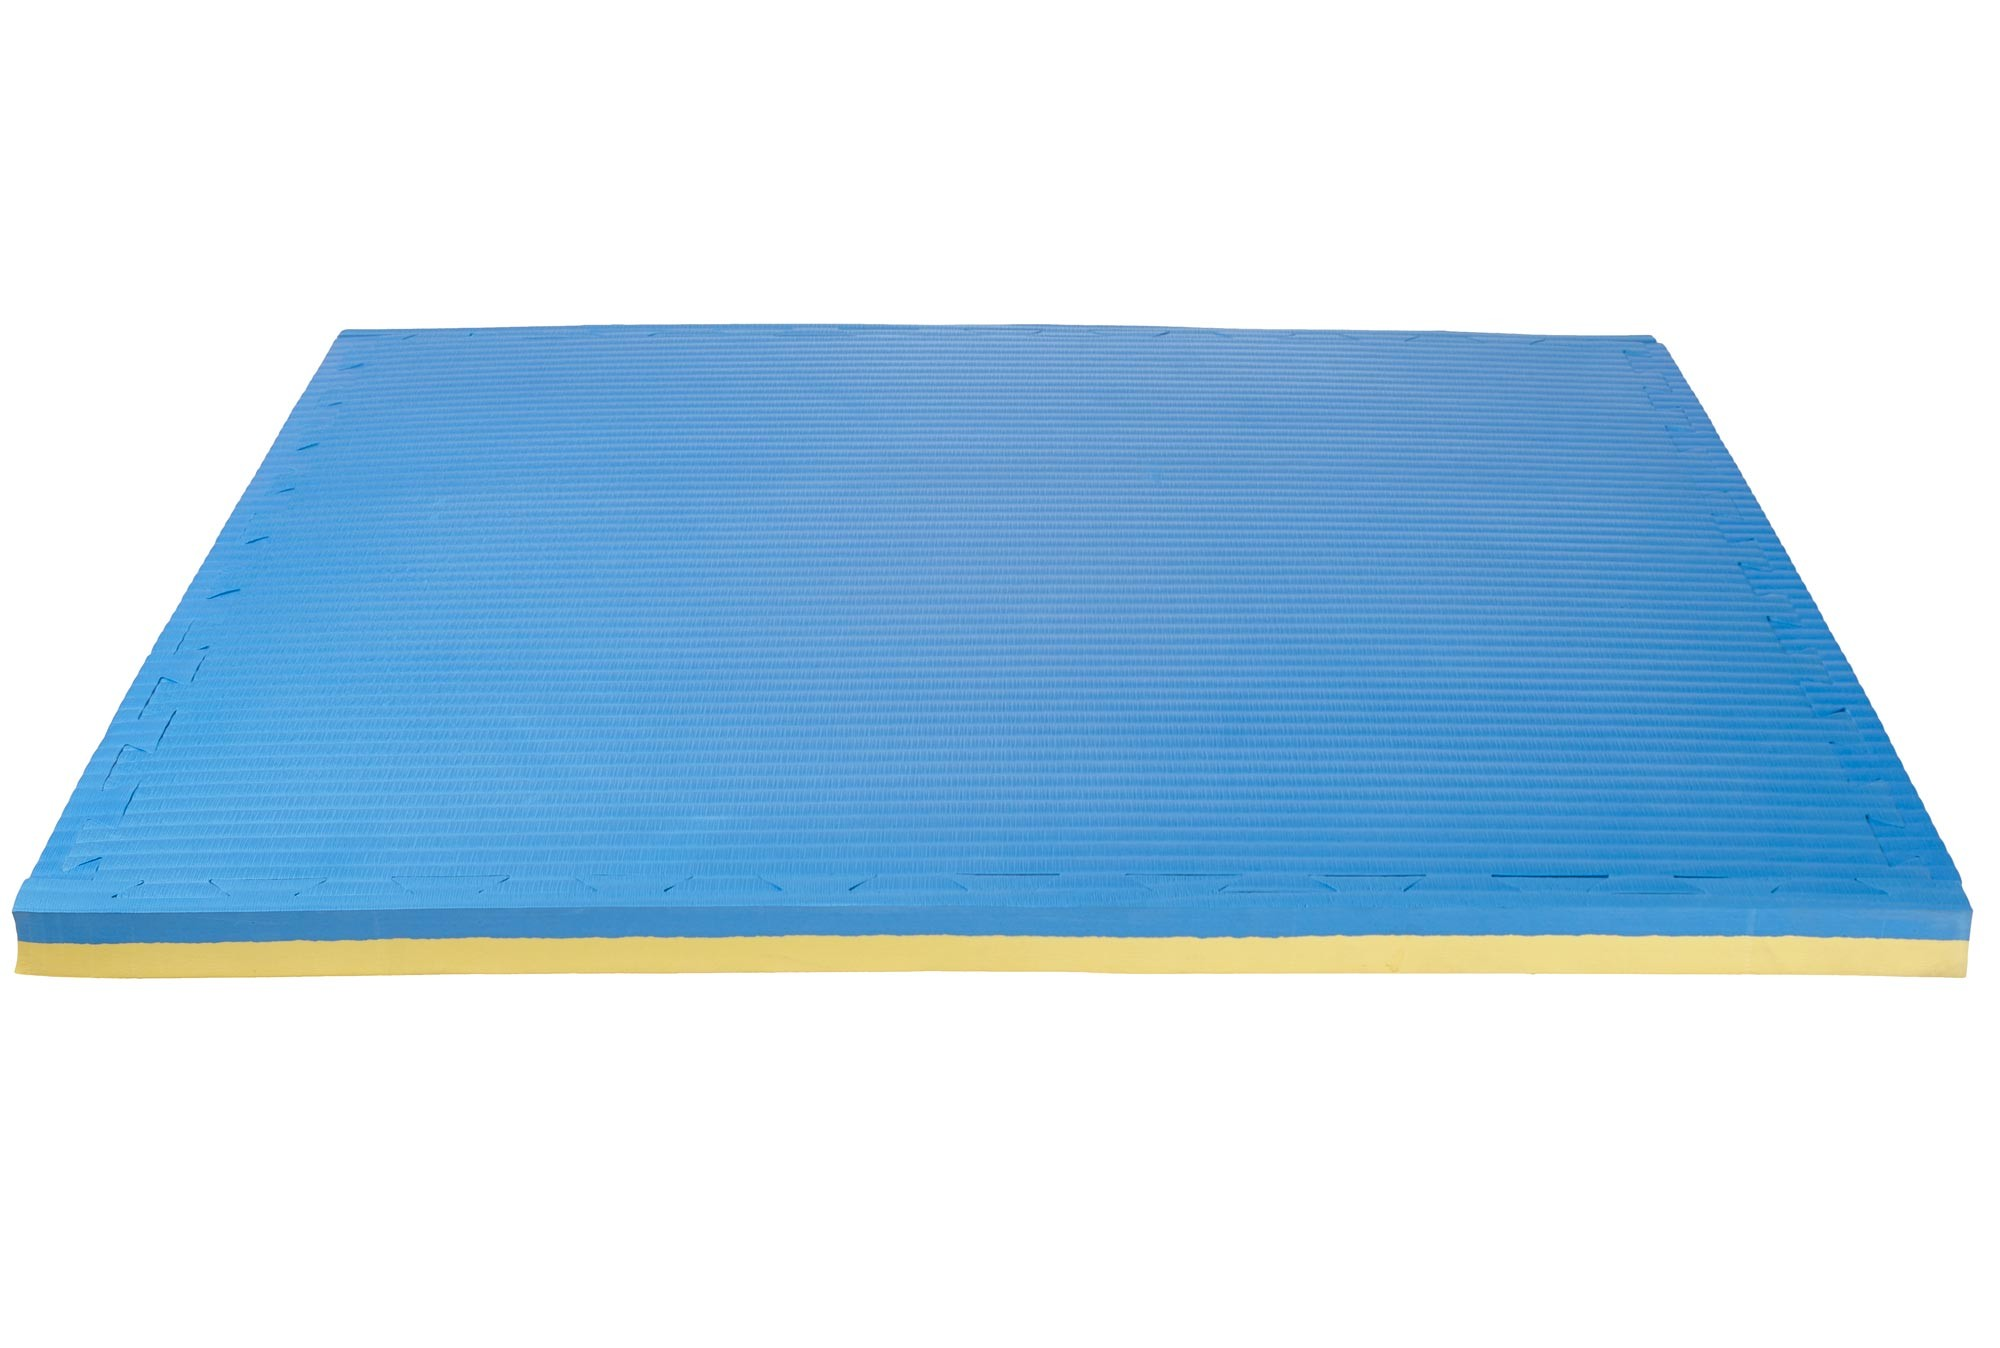 Ju-Sports Puzzlematte Tatami 4 cm rot//blau Wendematte